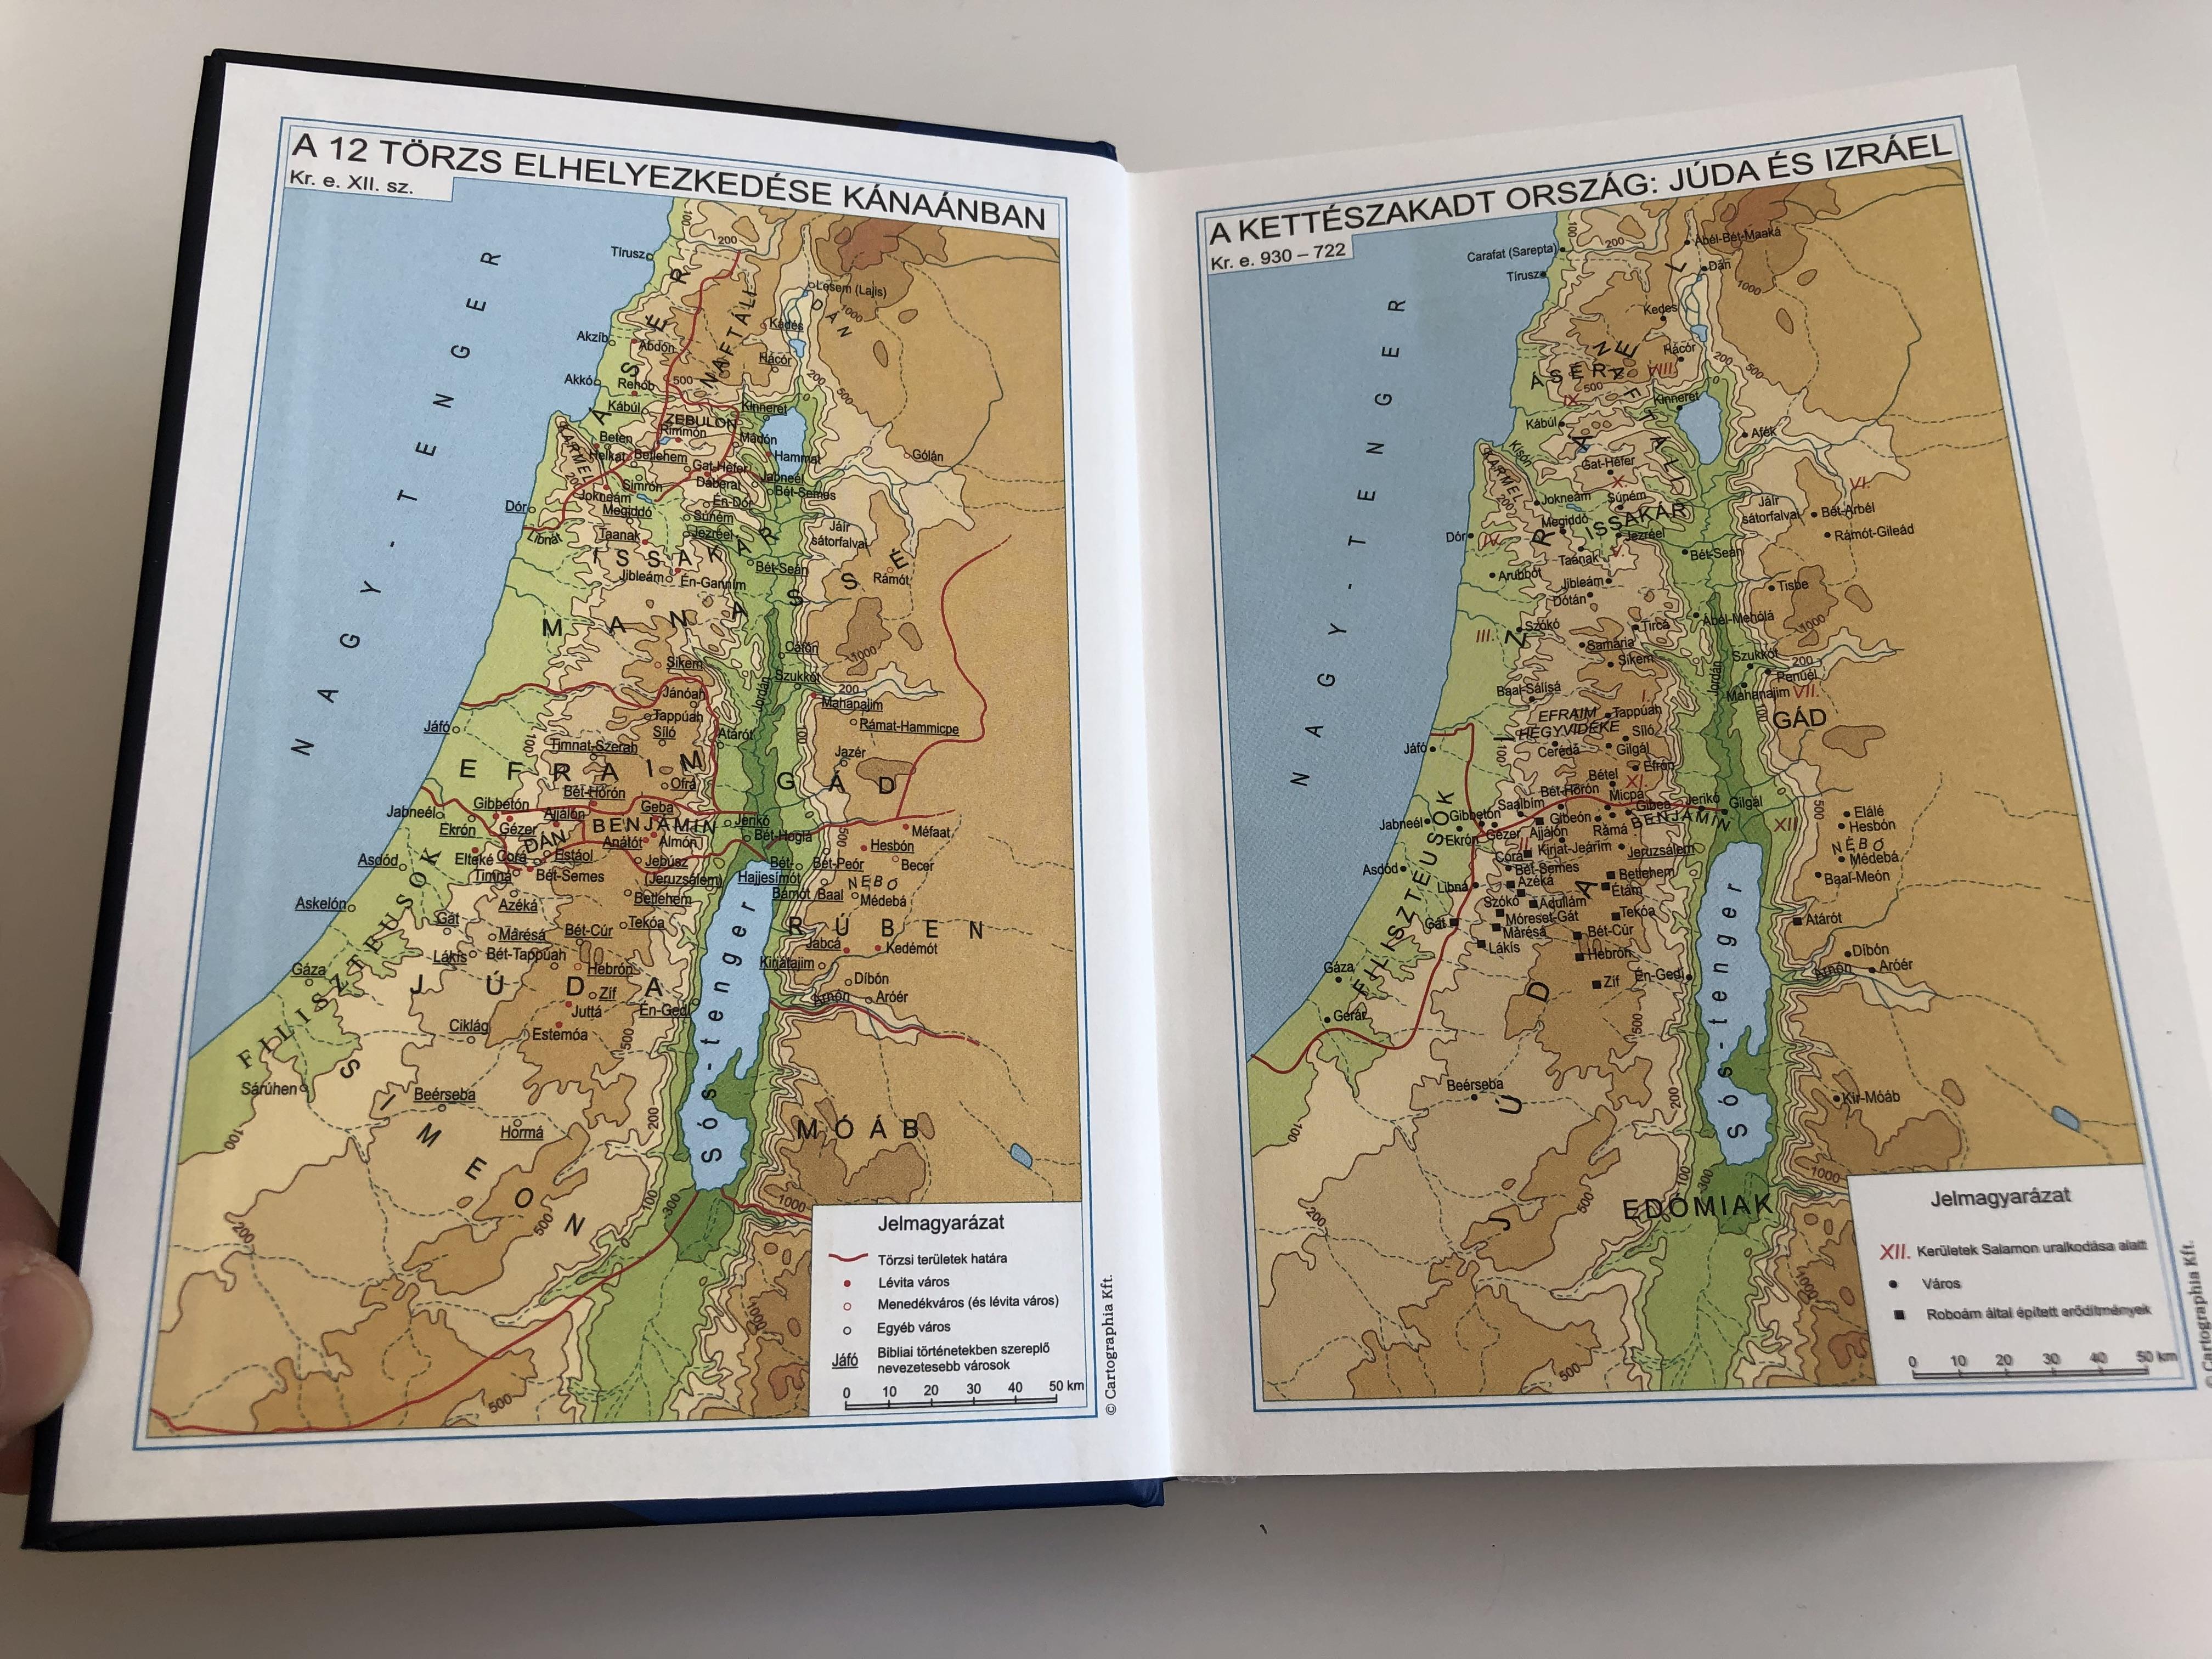 biblia-istennek-az-sz-vets-gben-s-jsz-vets-gben-adott-kijelent-se-r-f-2014-hungarian-language-bible-revised-translation-2015-hardcover-k-lvin-kiad-2018-blue-black-mid-size.jpg